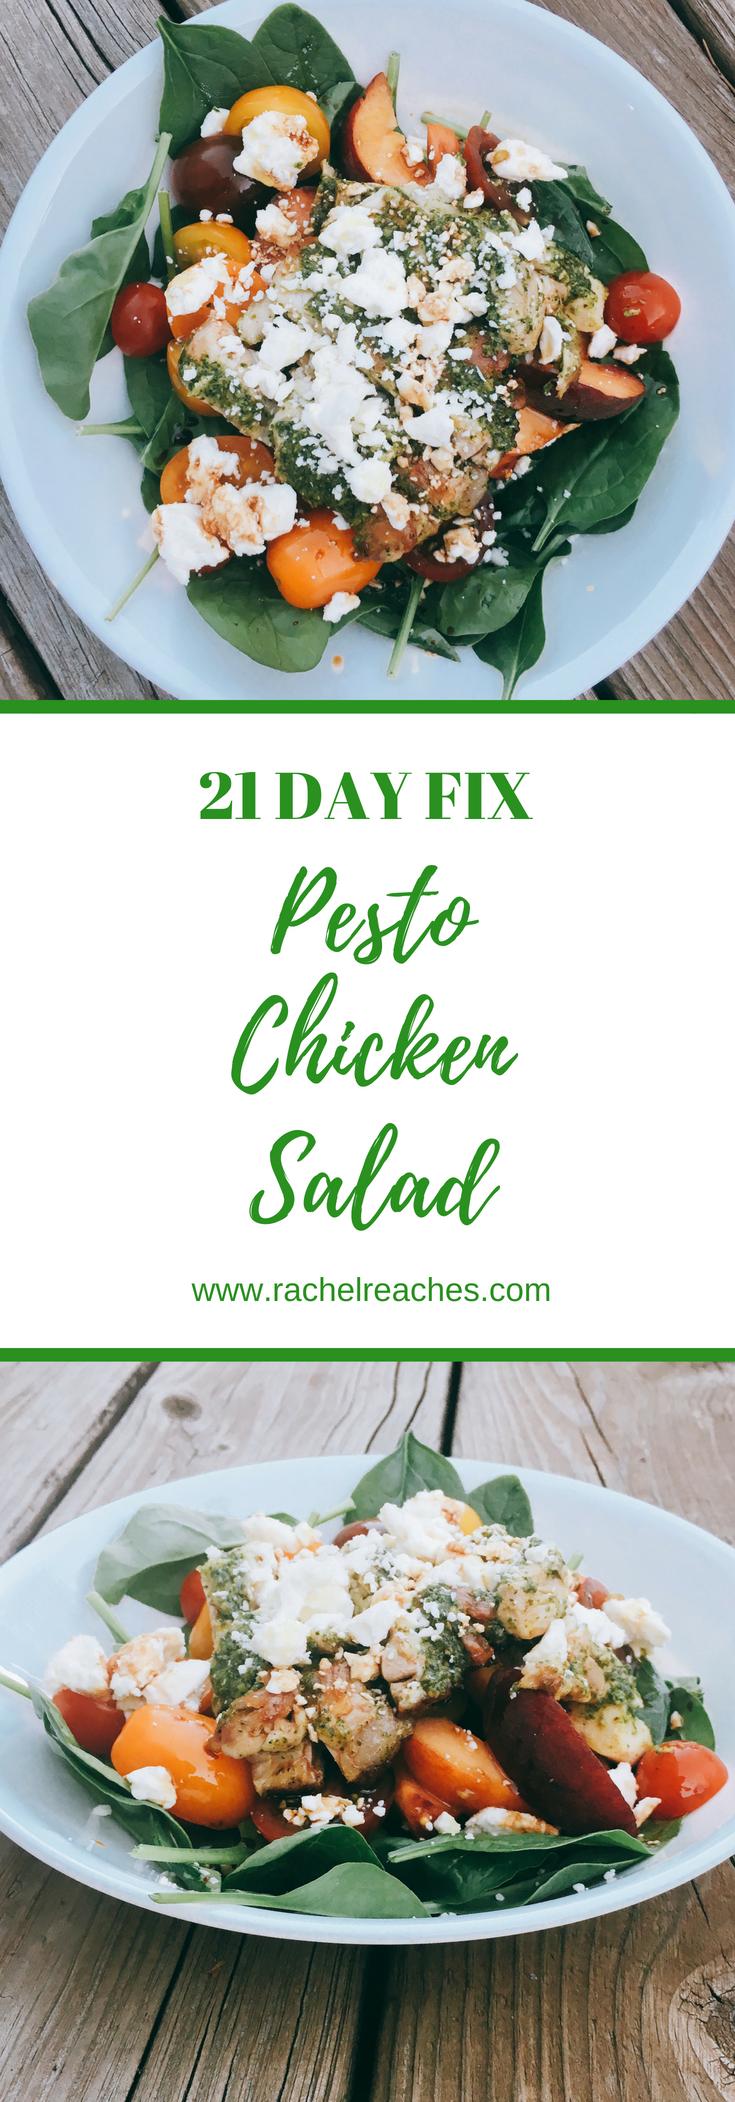 Pesto Chicken Pinterest Pin - 21 Day Fix.png